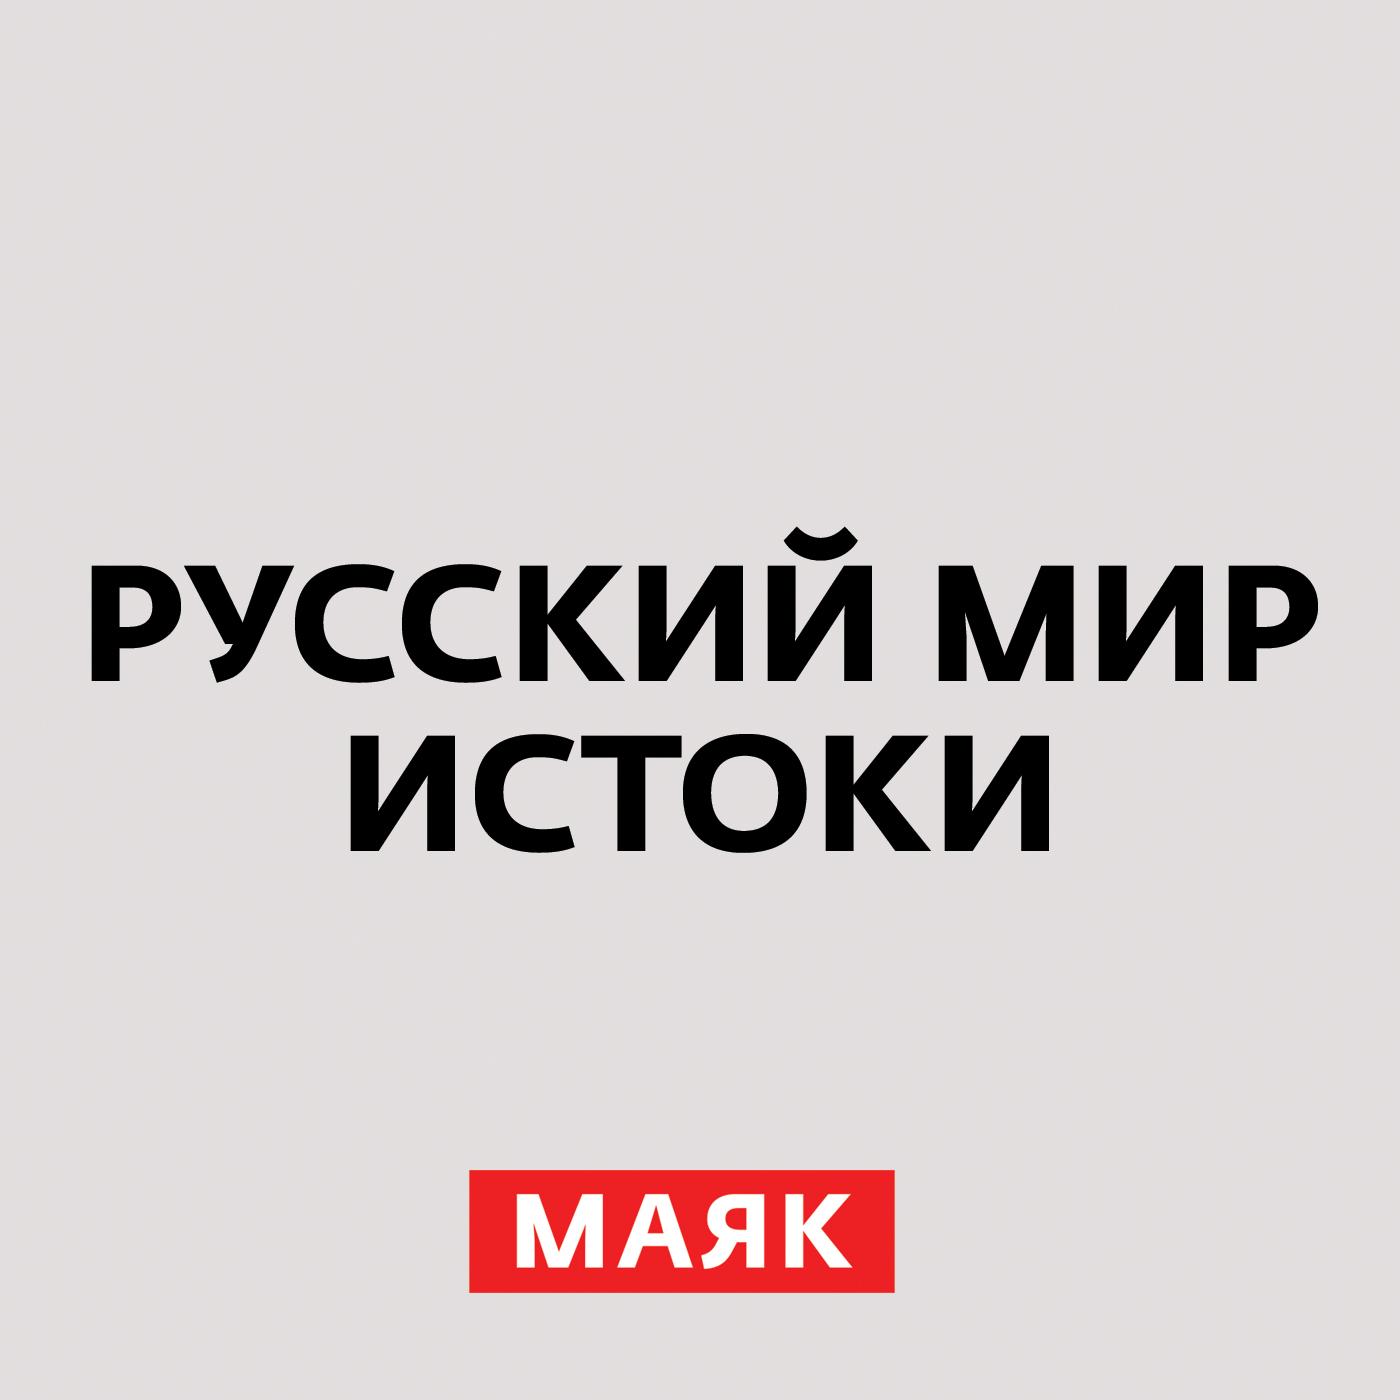 Творческий коллектив радио «Маяк» Фёдор III Алексеевич волков алексей алексеевич командор петра великого